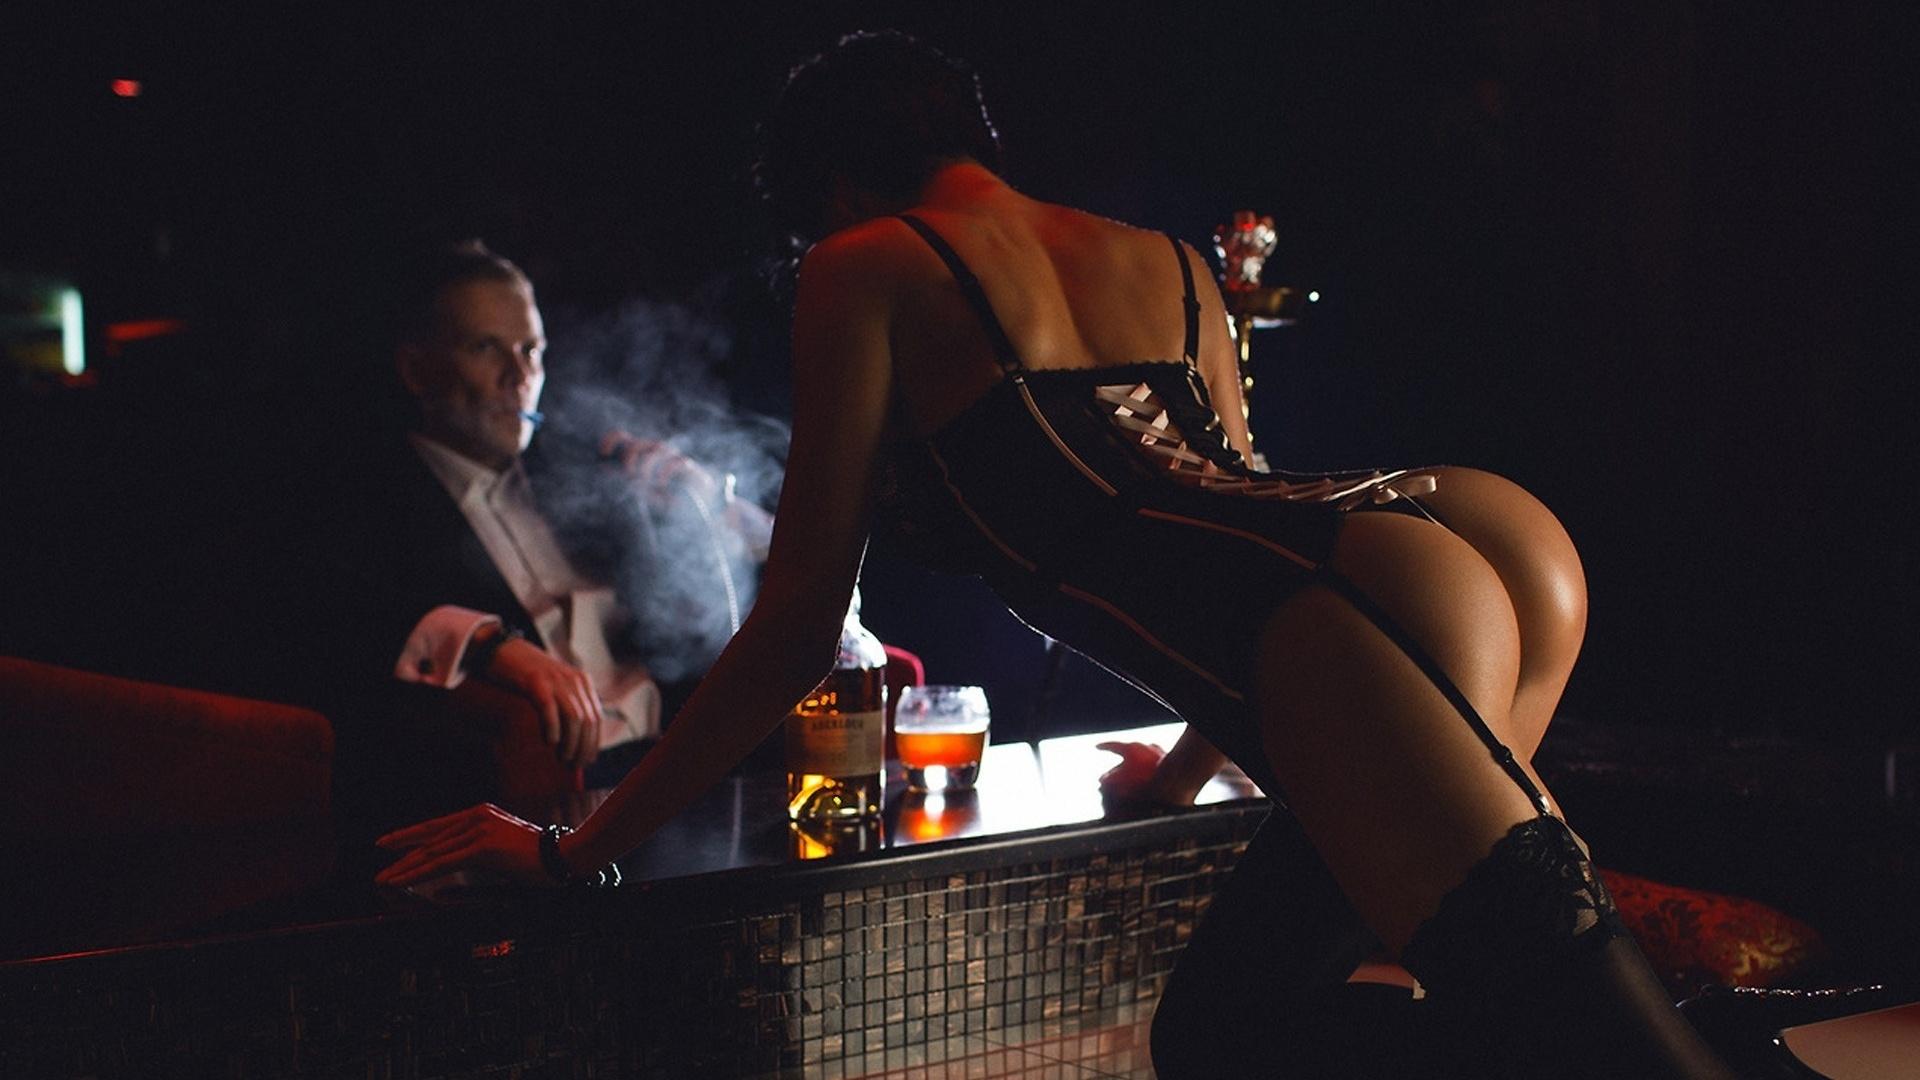 Секси девушки стриптиз 11 фотография